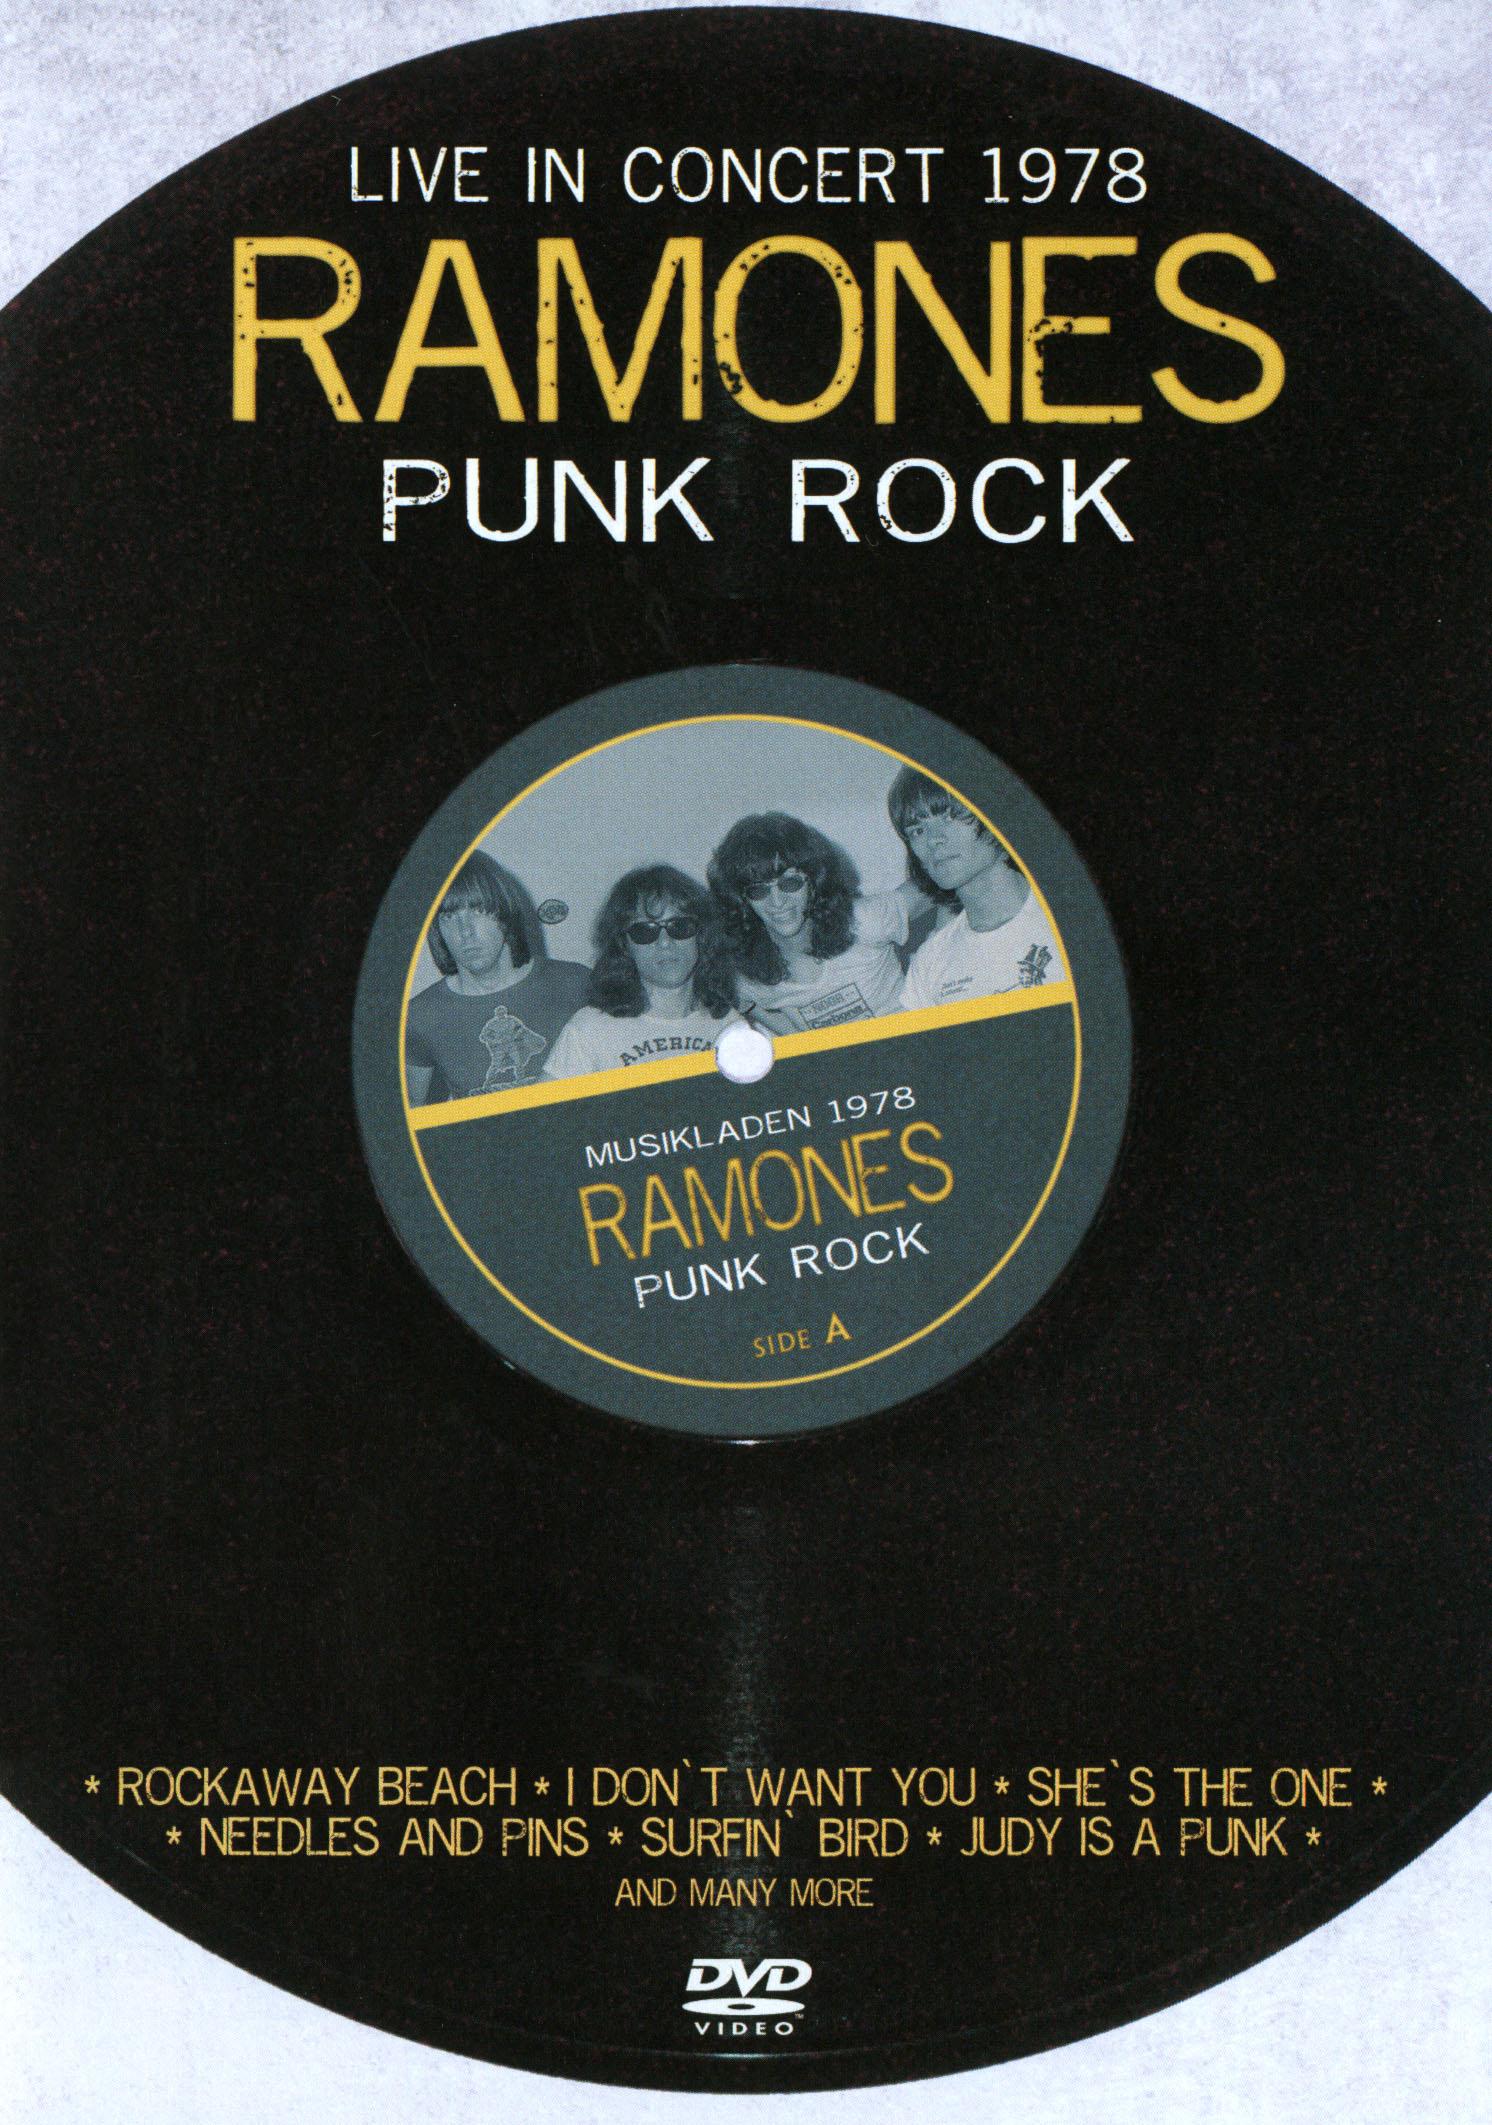 Musikladen 1978: Ramones - Punk Rock